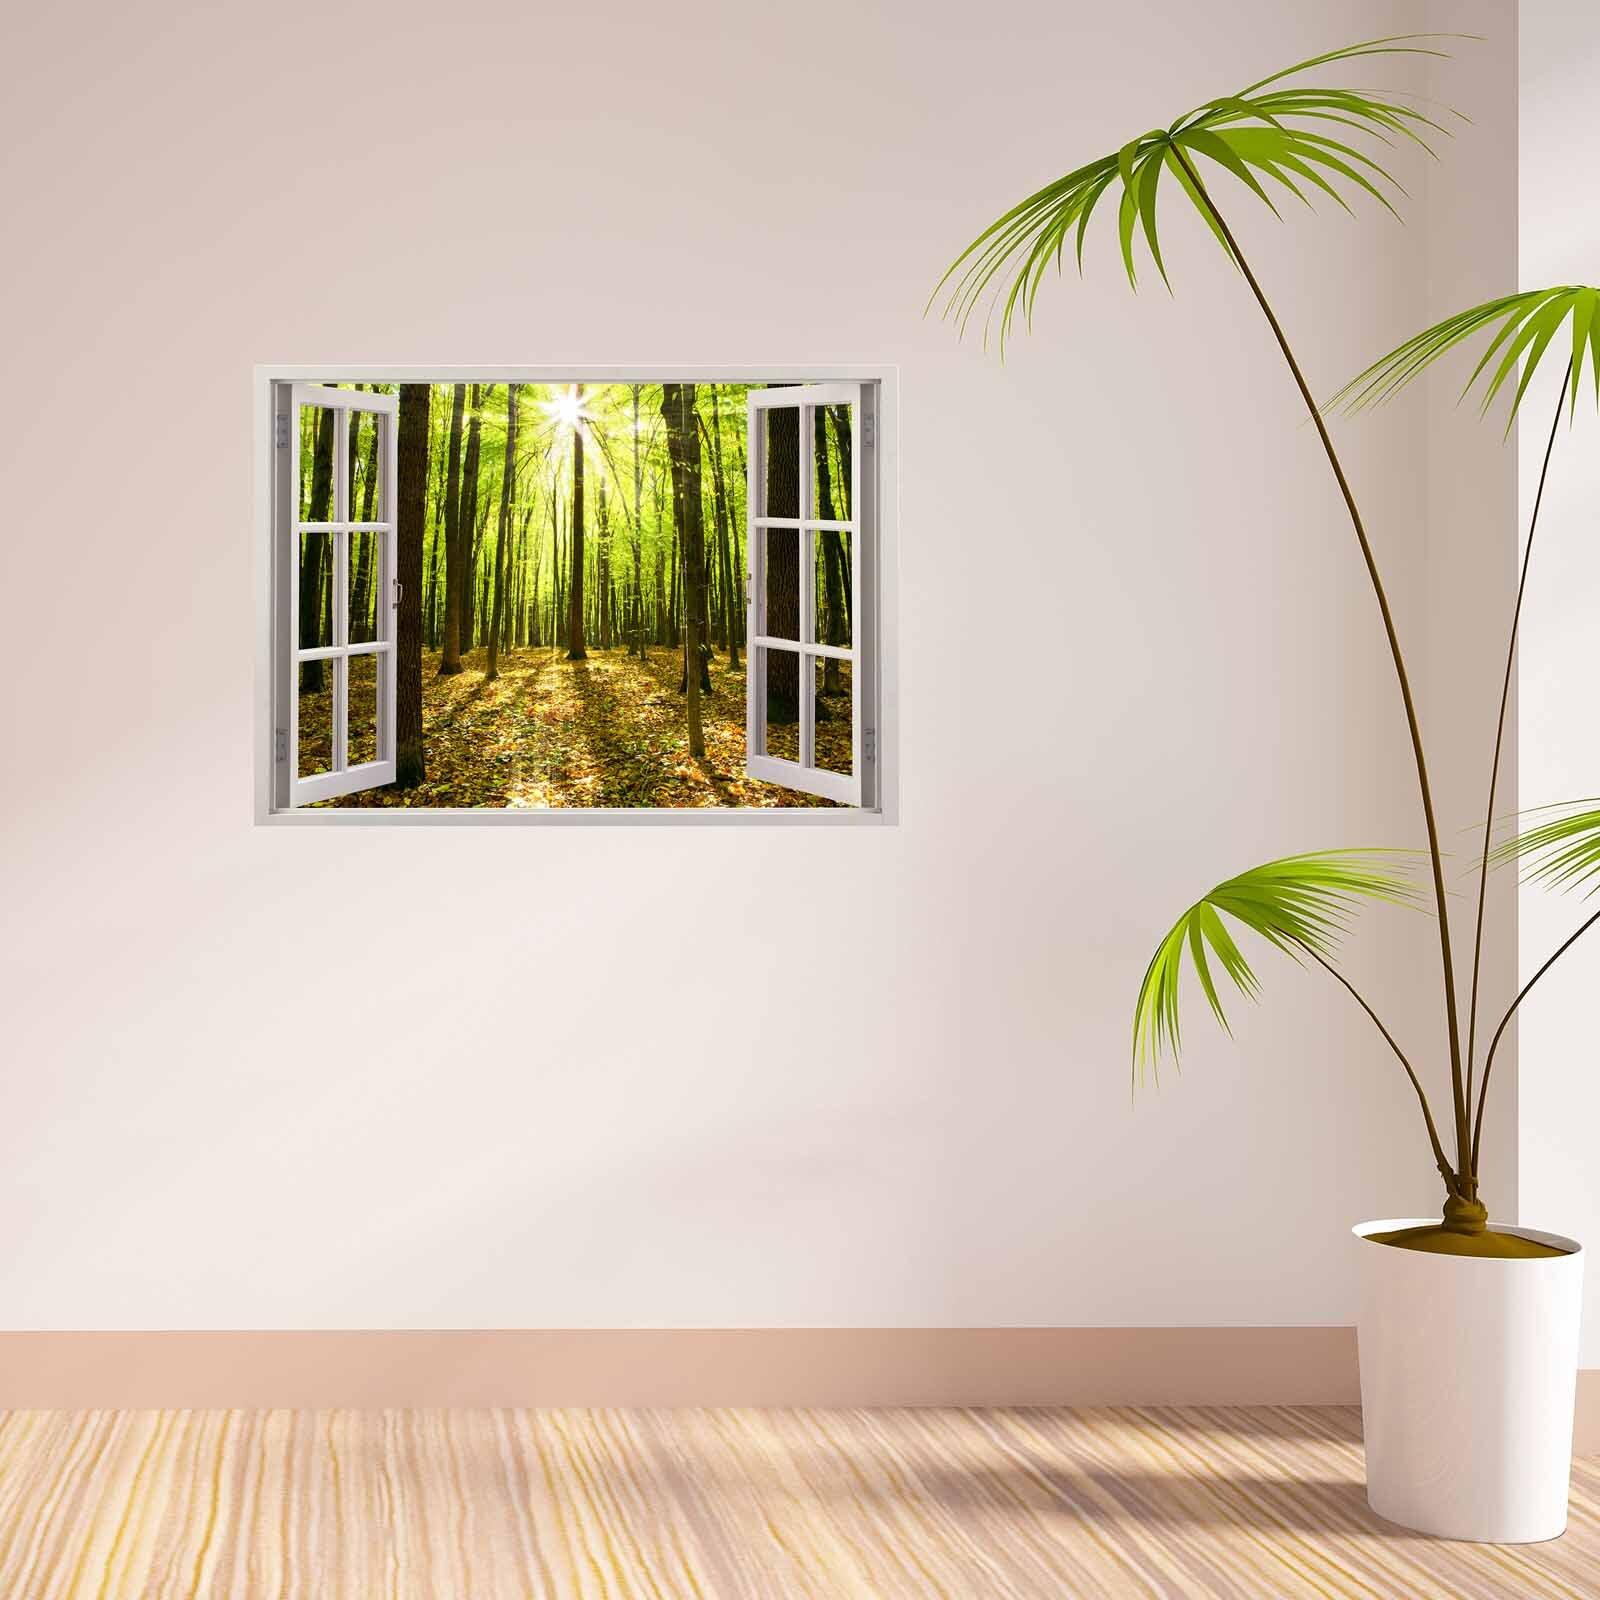 Sticker decorativ pentru perete Wall 3D